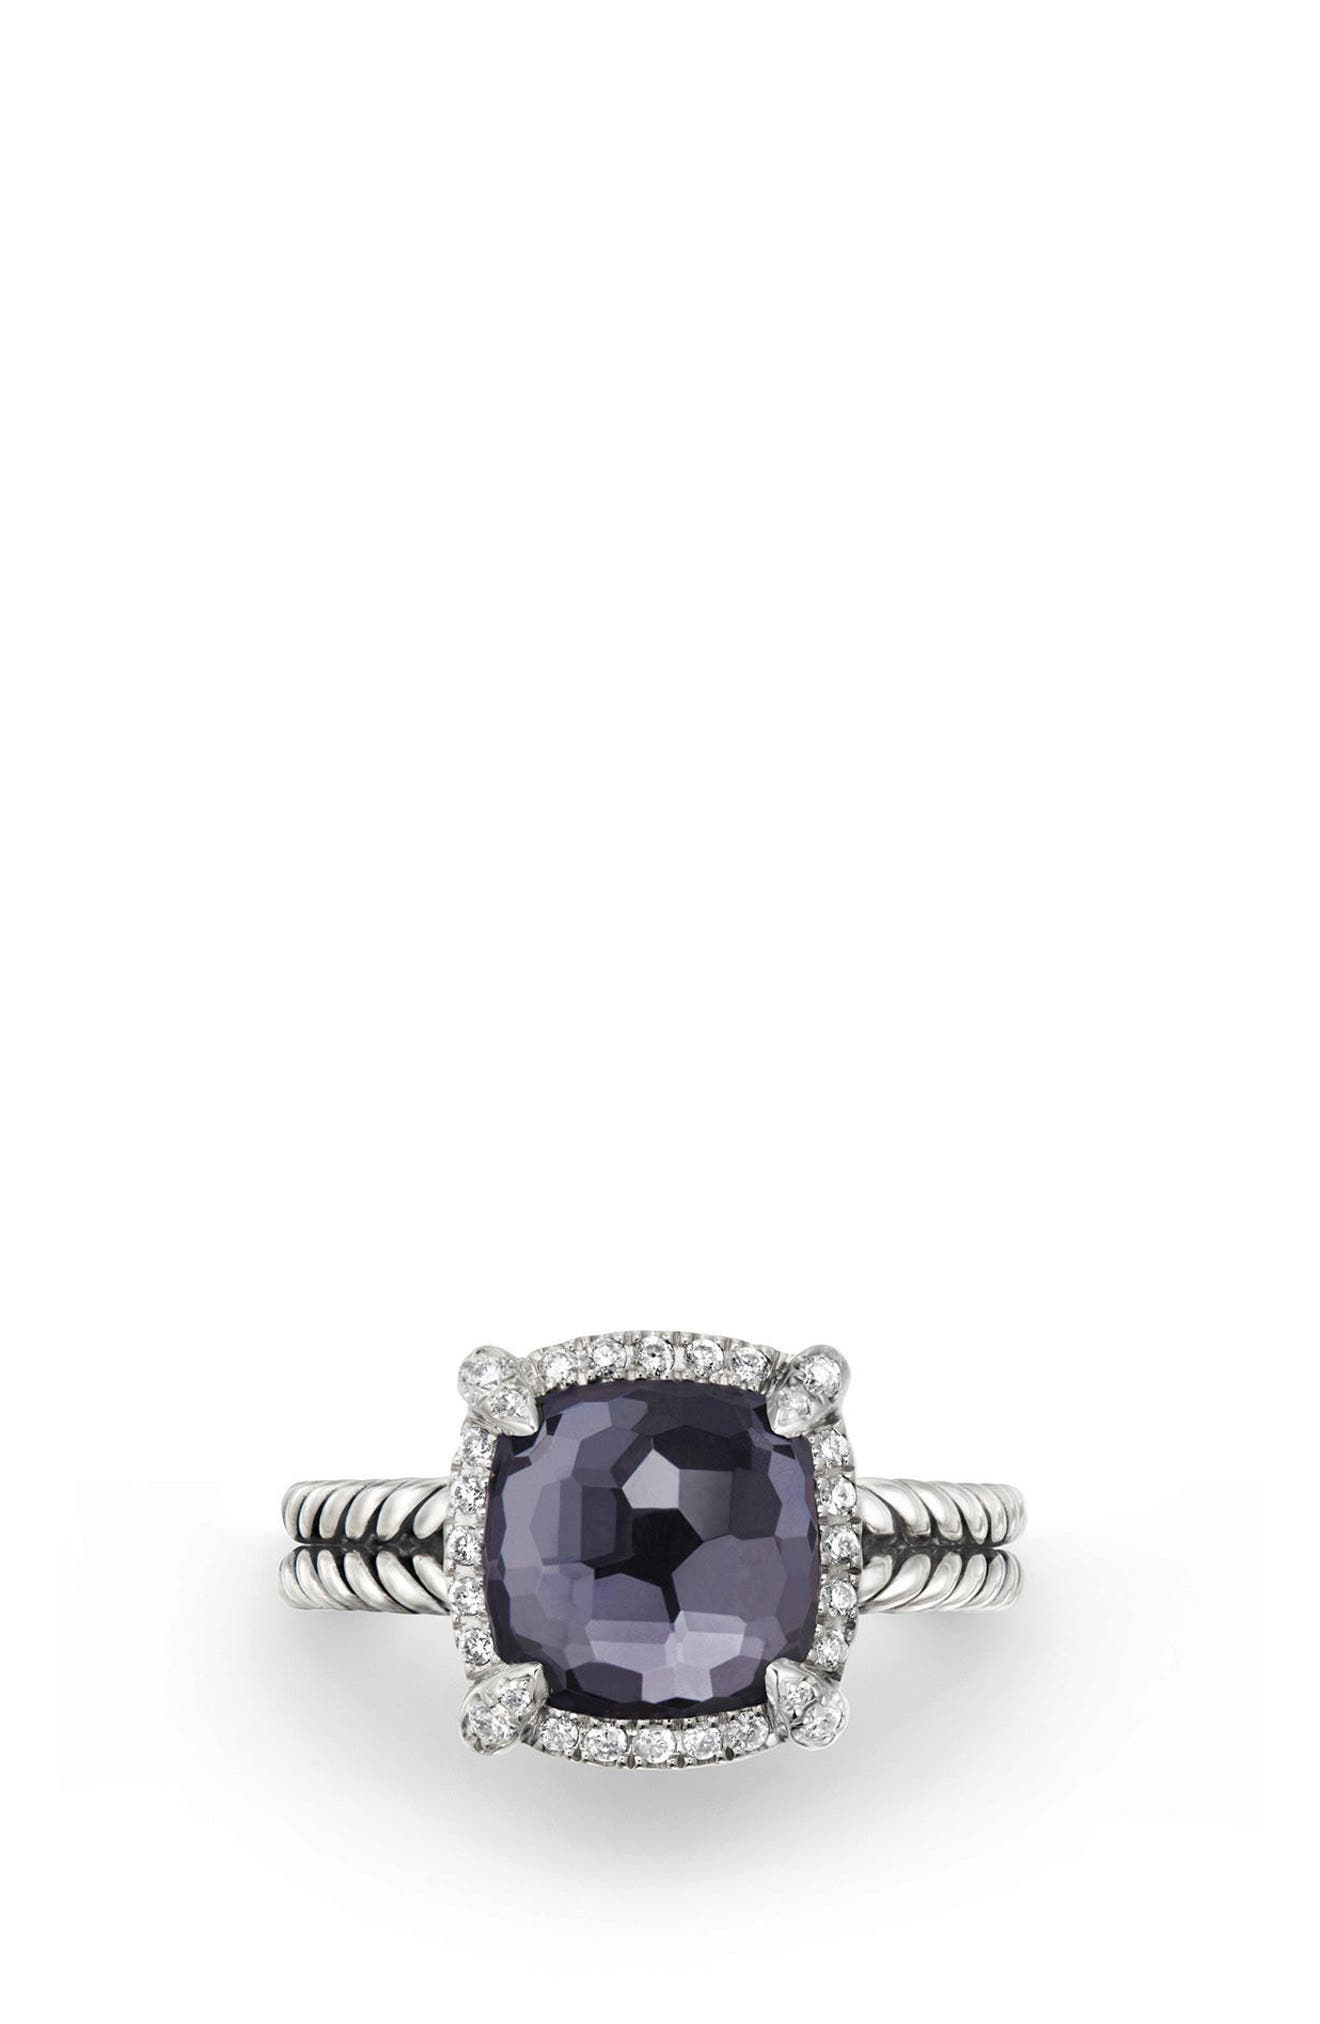 Châtelaine Pavé Bezel Ring with Black Orchid & Diamonds, 9mm,                             Alternate thumbnail 3, color,                             509